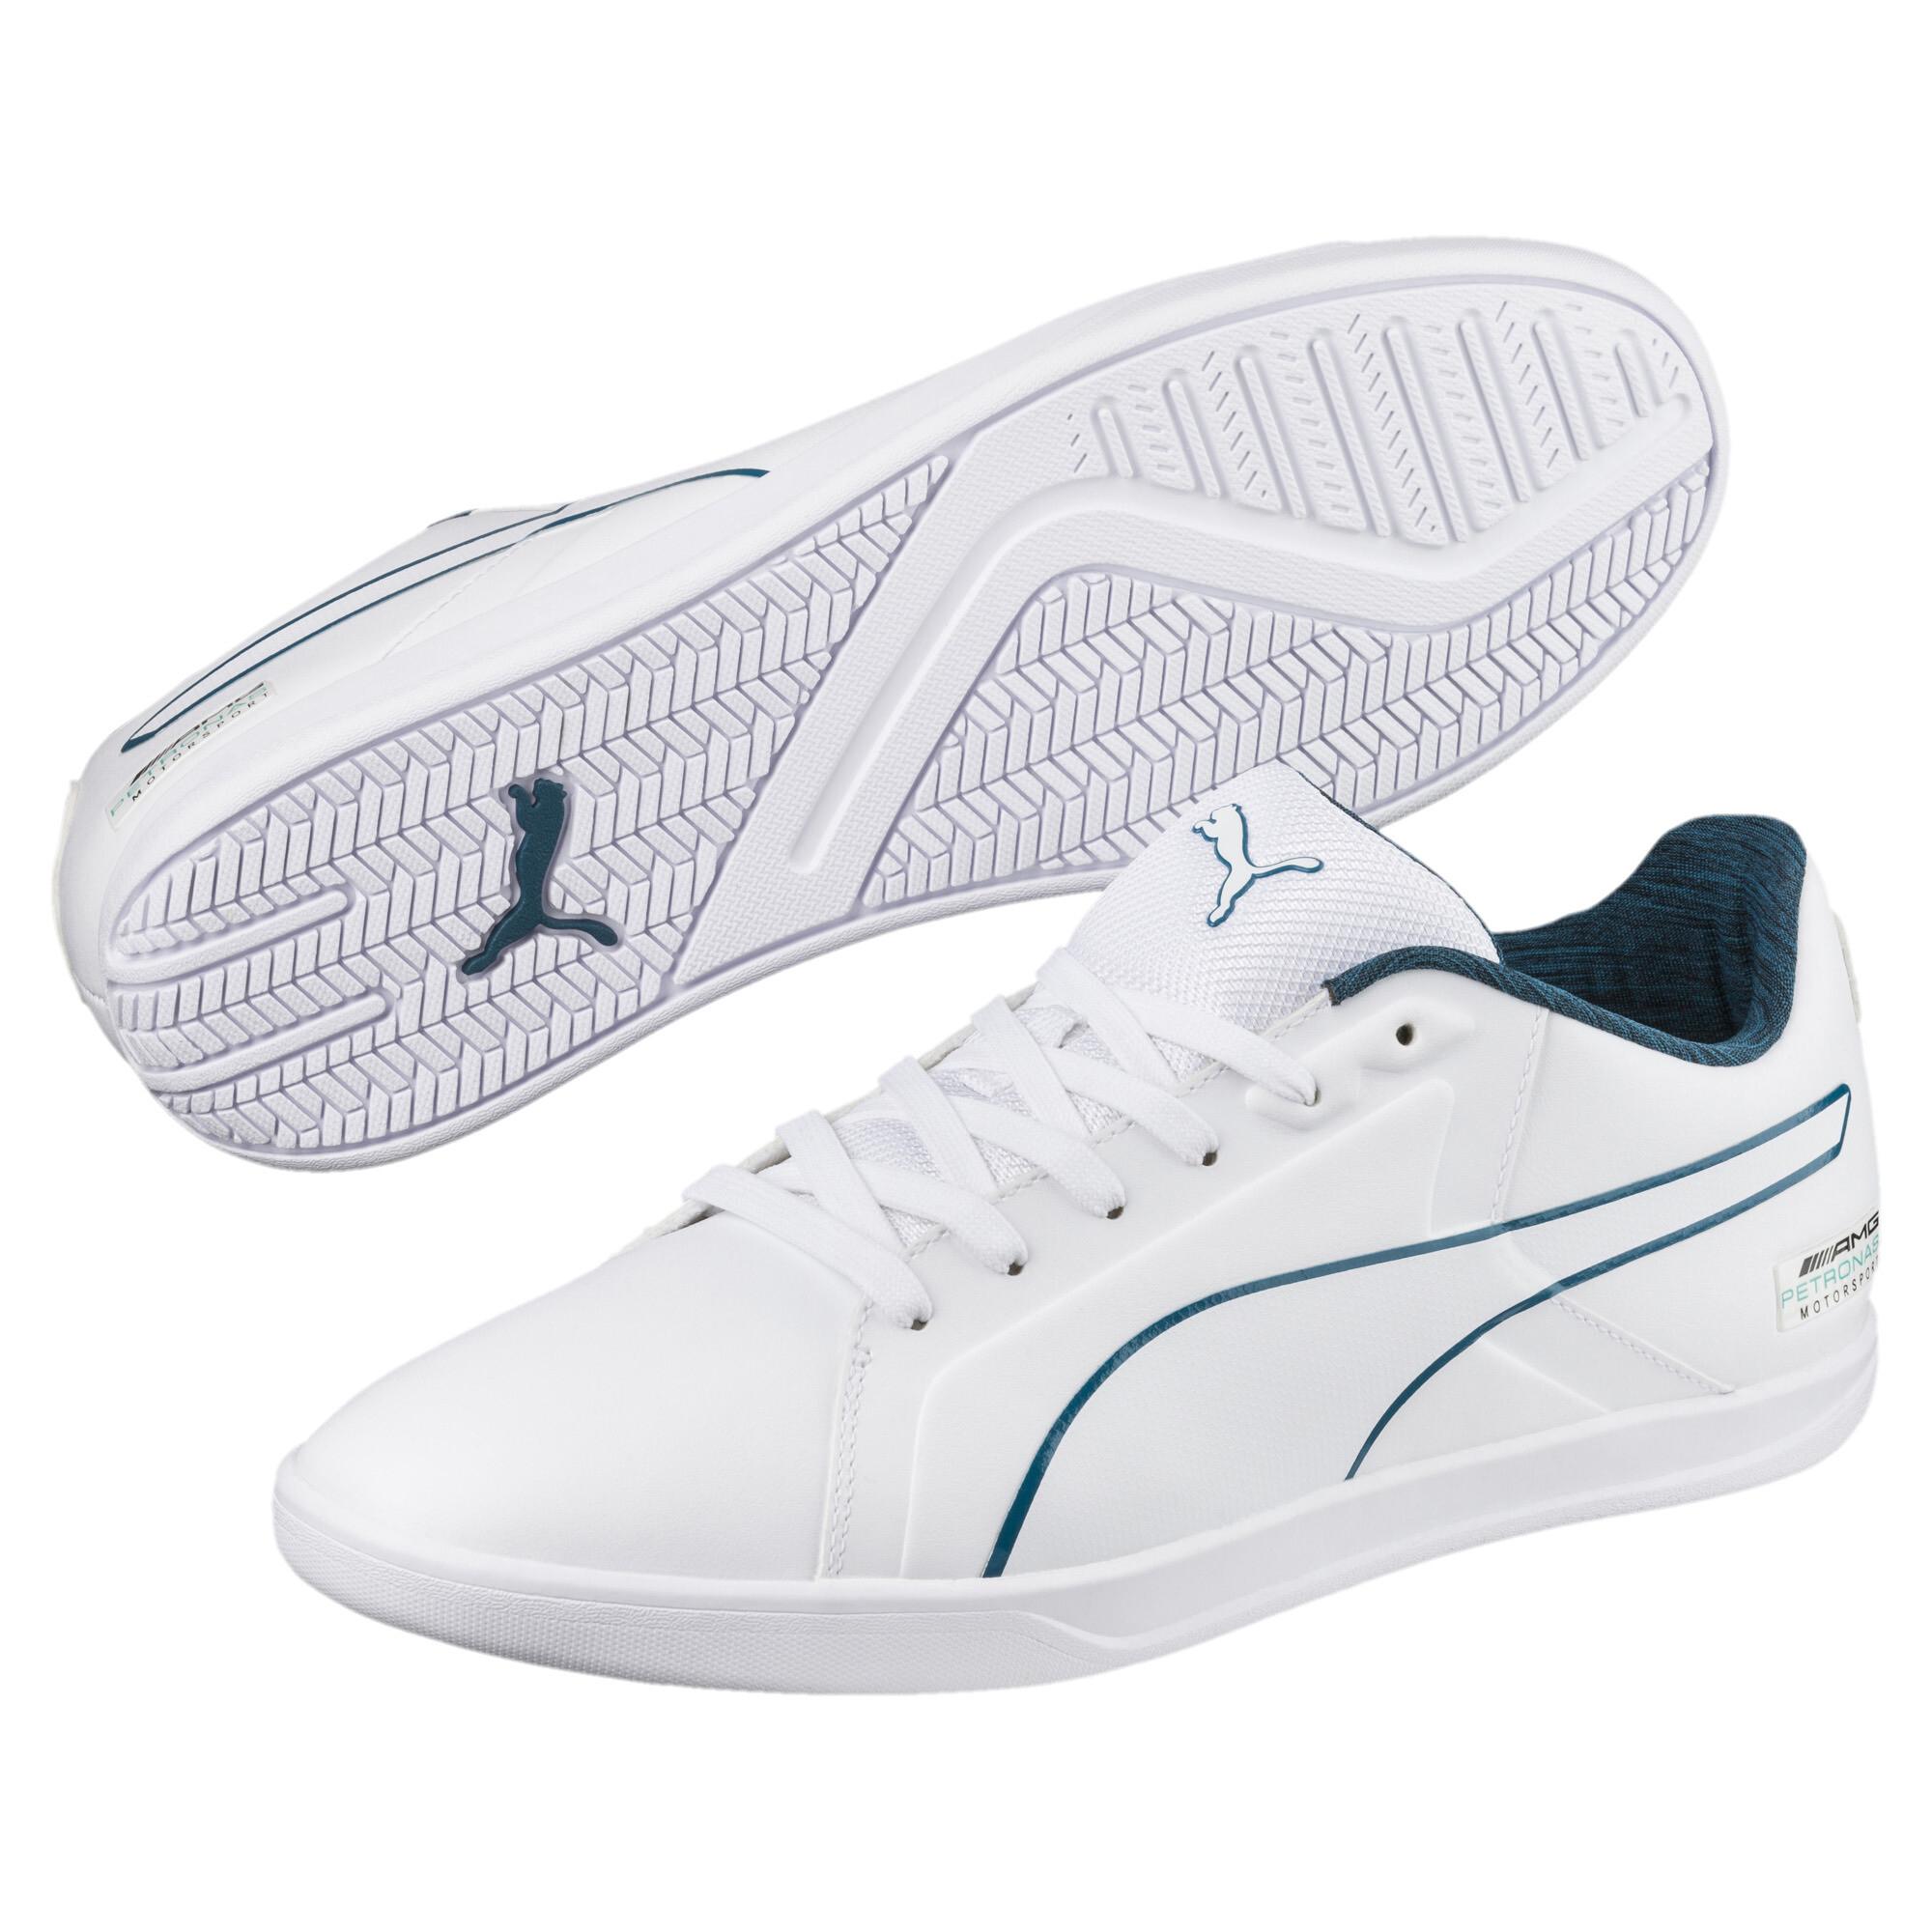 Mode Große Schuhe Online Verkauf : Puma Mercedes Amg